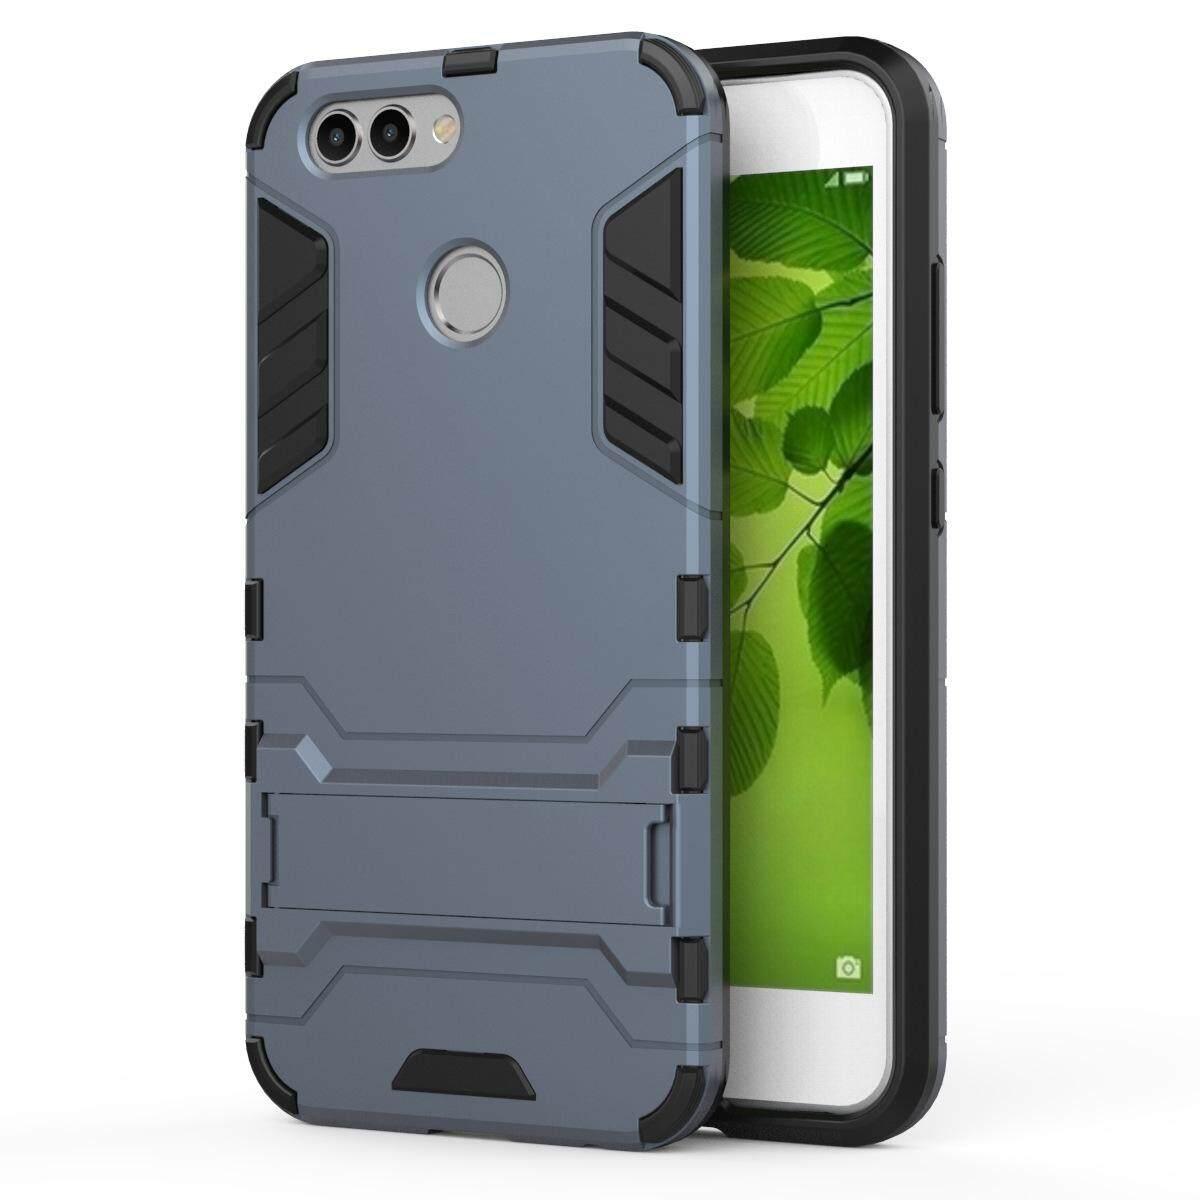 Hình ảnh for Huawei Nova 2 Case 2in1 PC+TPU Hybrid Slim Back Case Ultra Thin Armor Cover, with Kickstand Holder, Glossy, Minimalist, Casual